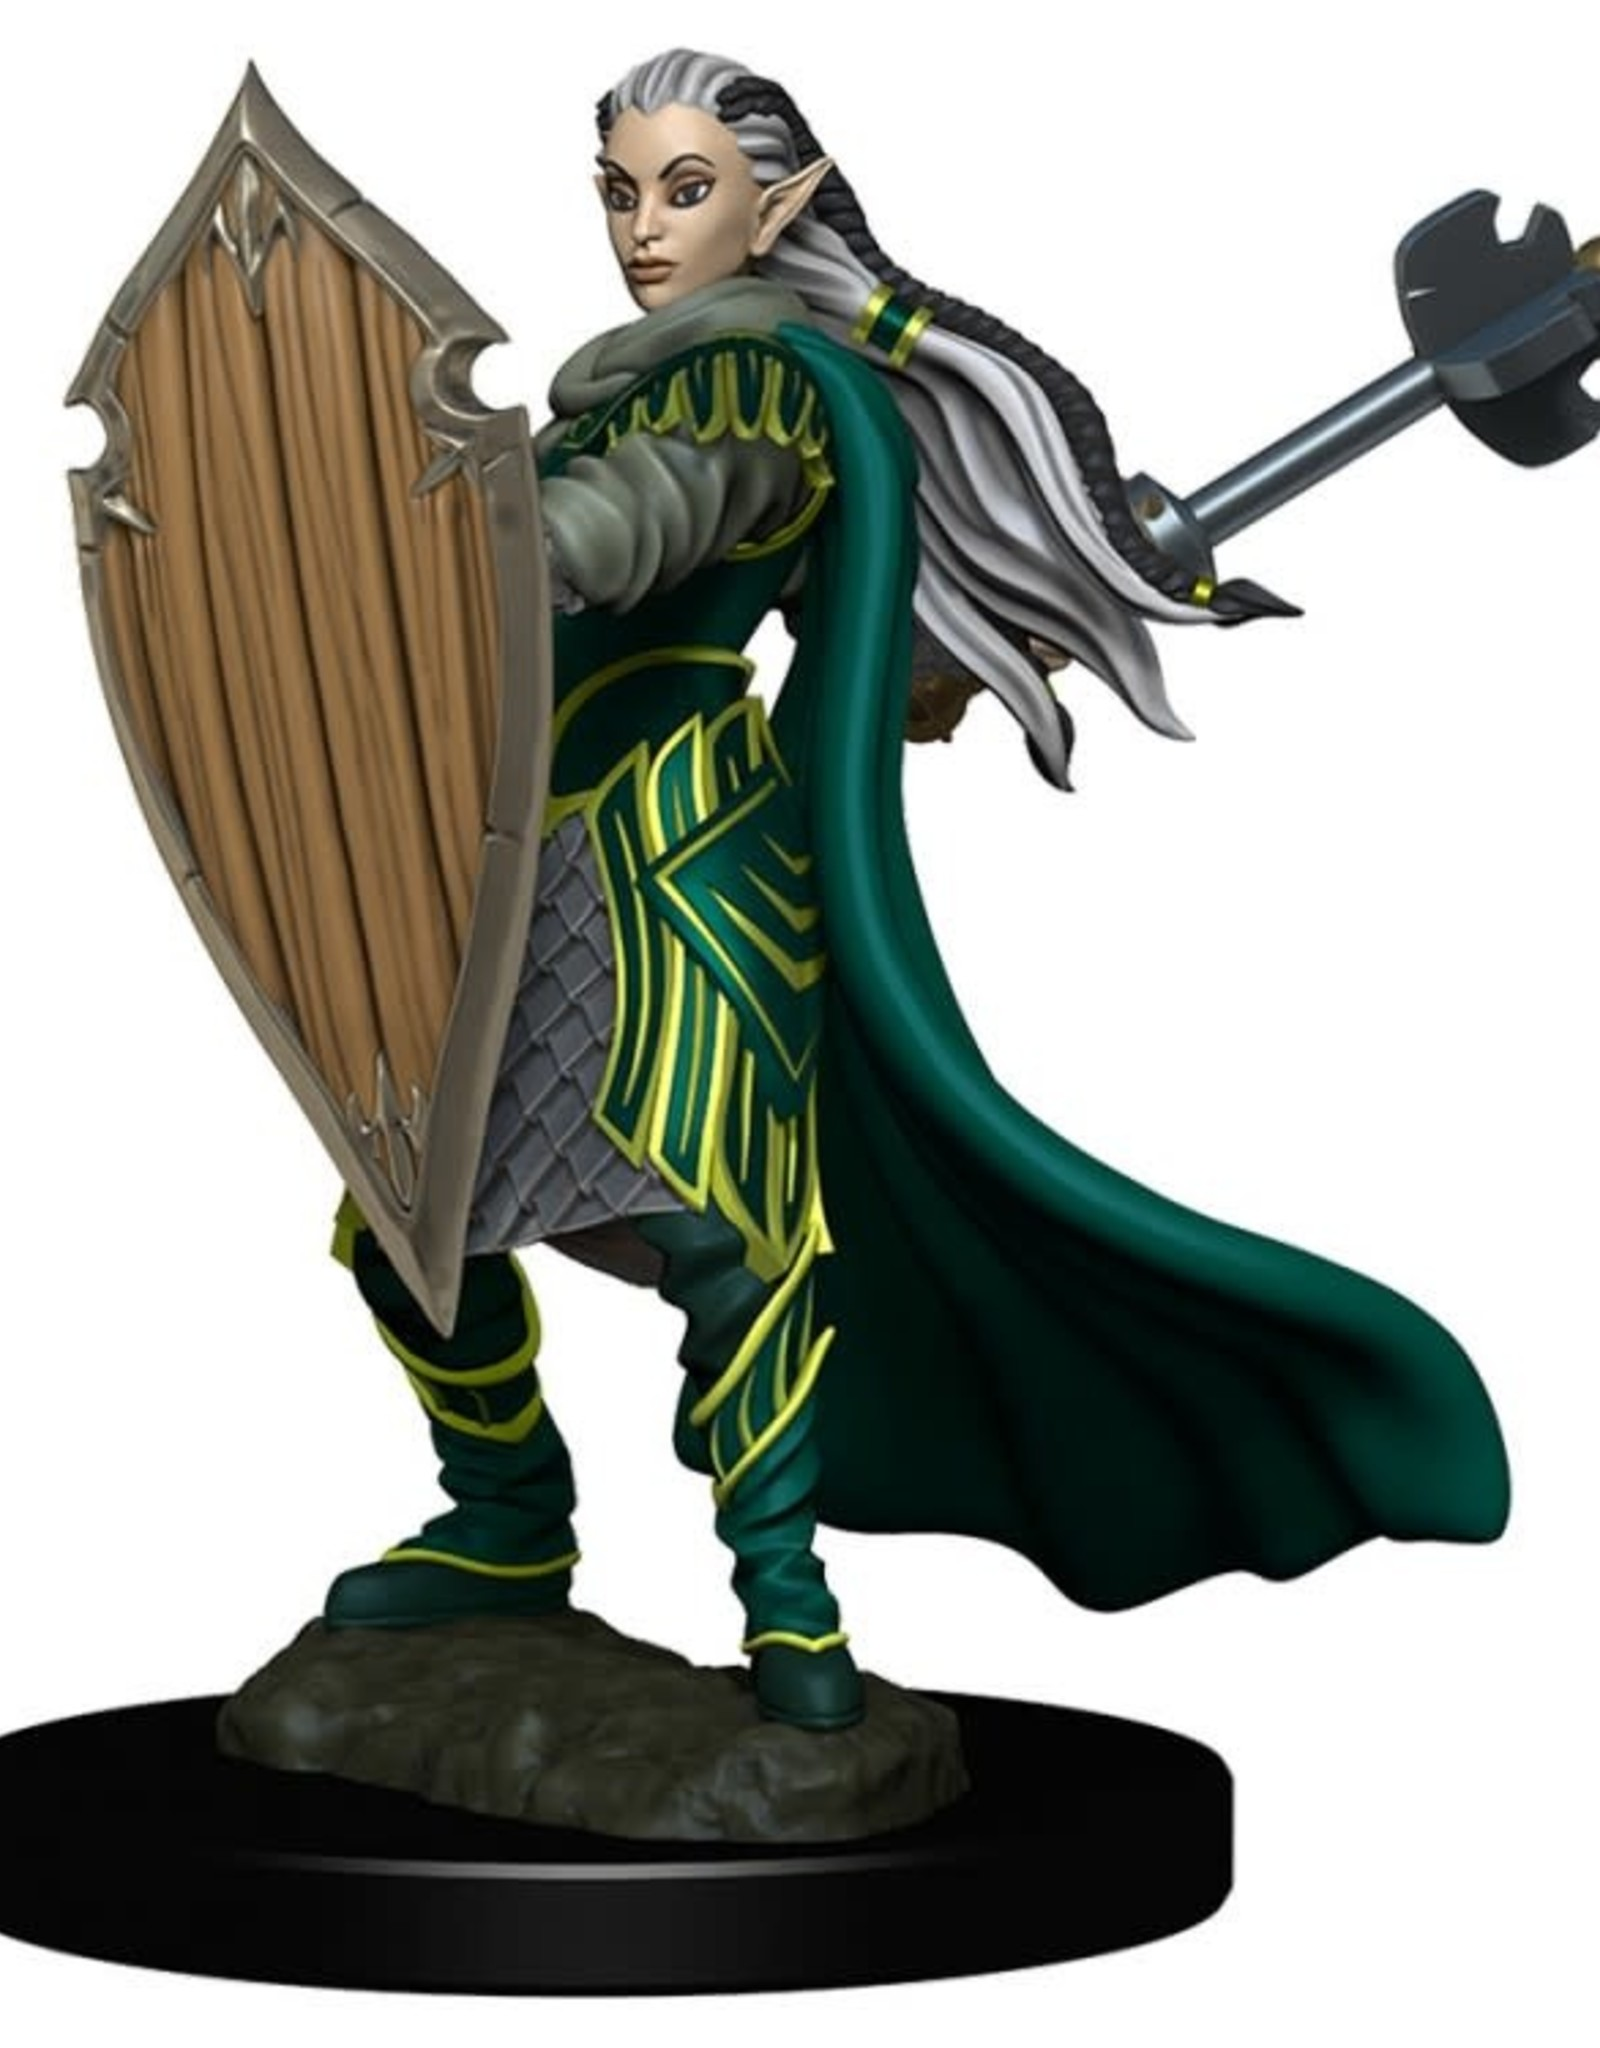 WizKids D&D Icons of the Realms Premium Figure: Elf Paladin